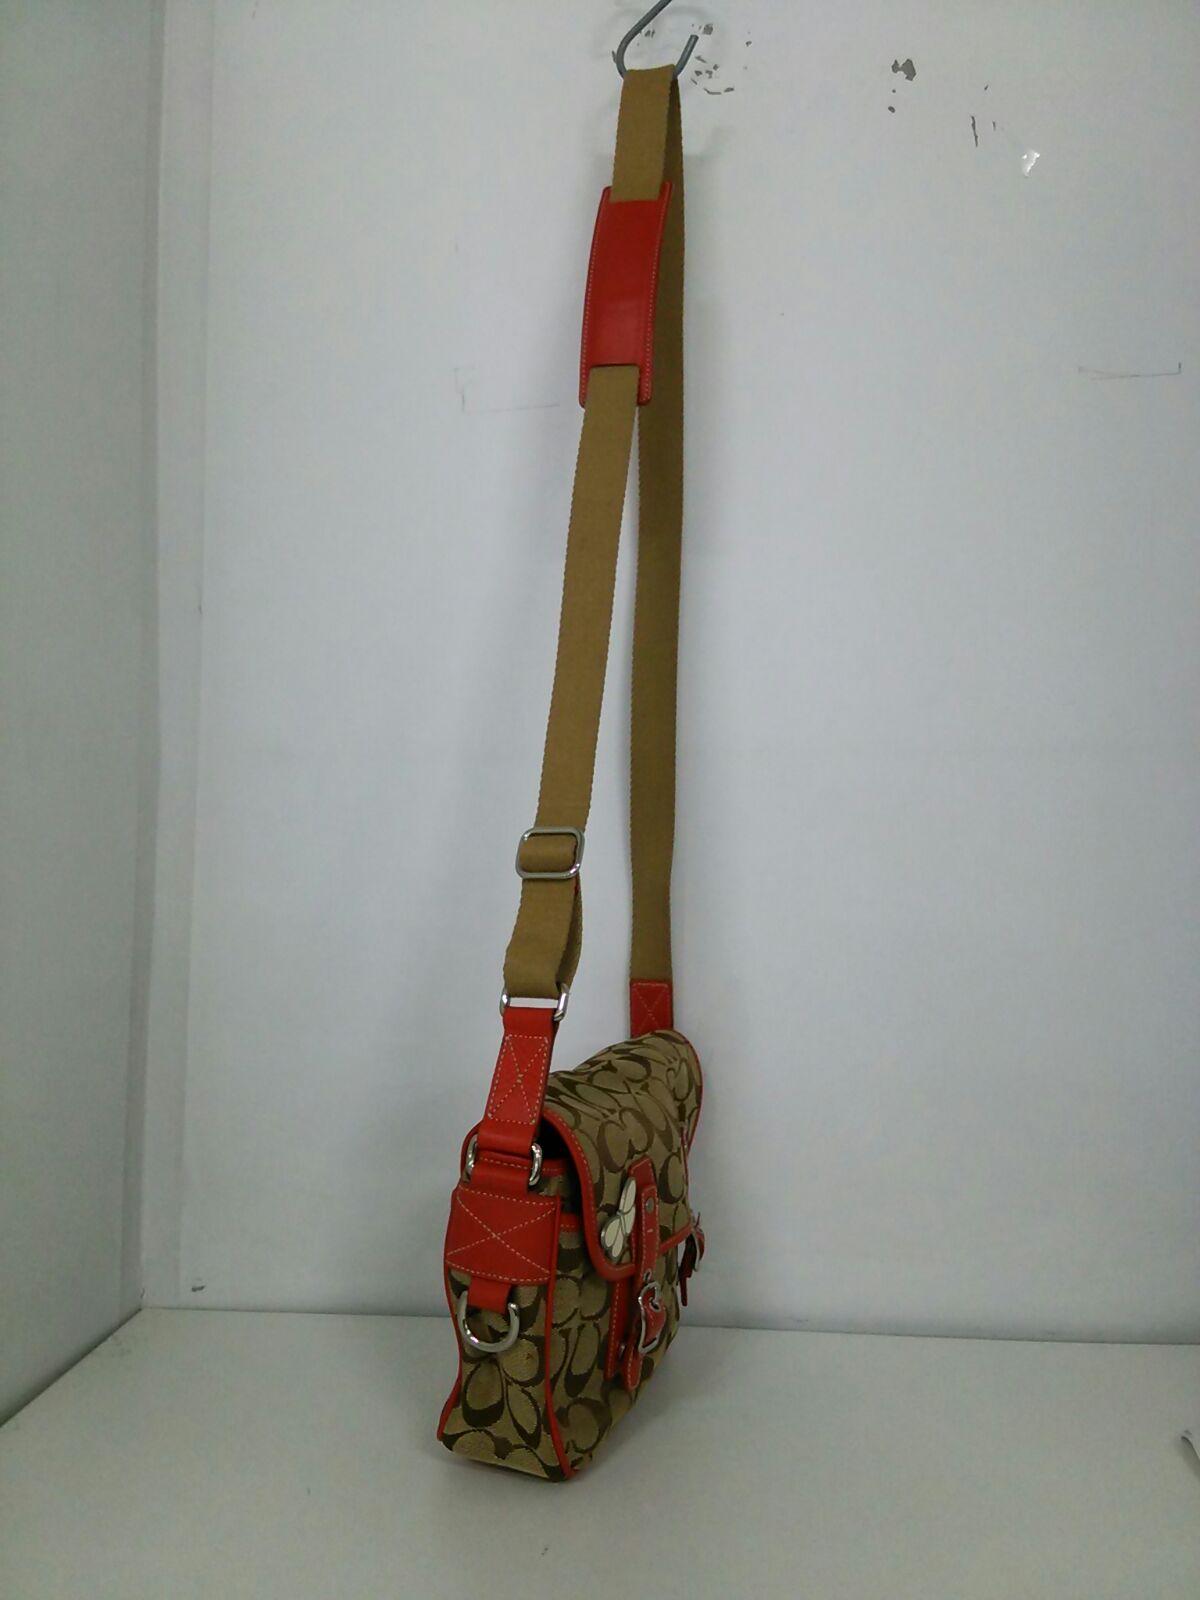 COACH(コーチ)のシグネチャーフィールドバッグ